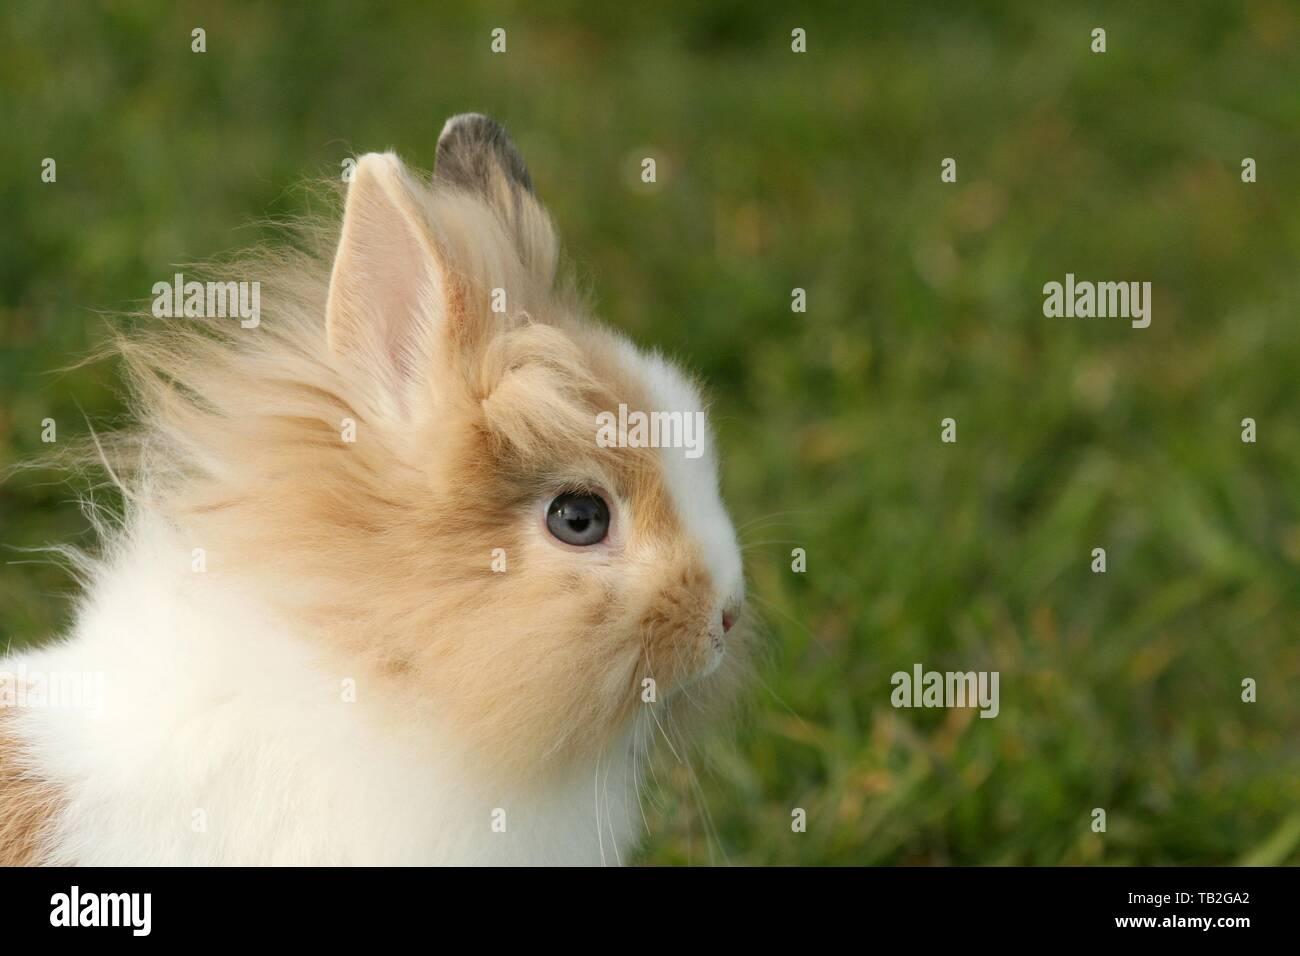 lion-headed rabbit Stock Photo